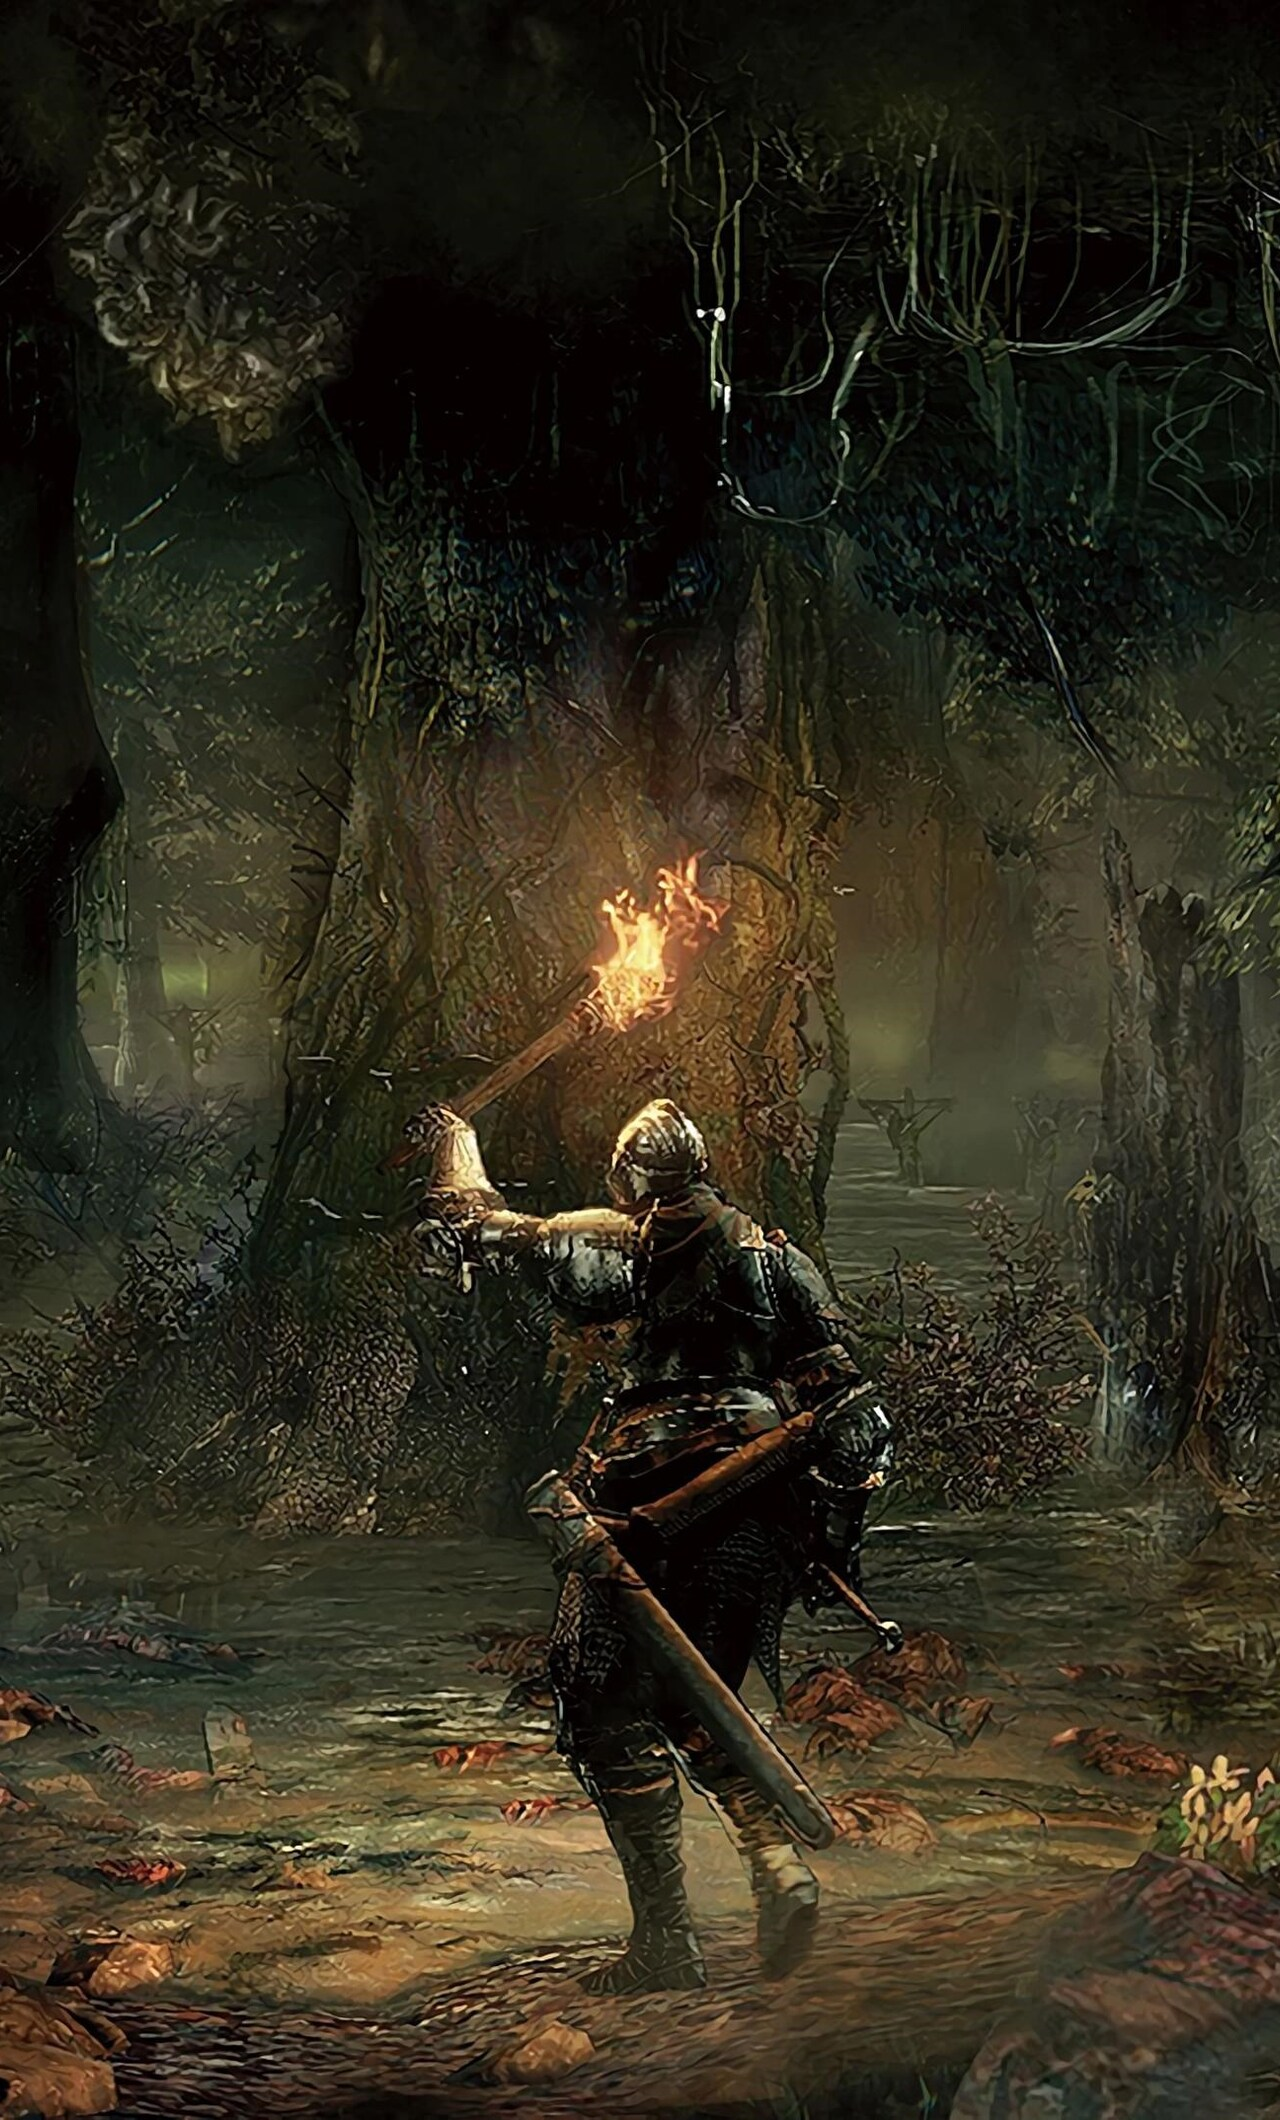 1280x2120 Dark Souls 3 Game Art Iphone 6 Hd 4k Wallpapers Images